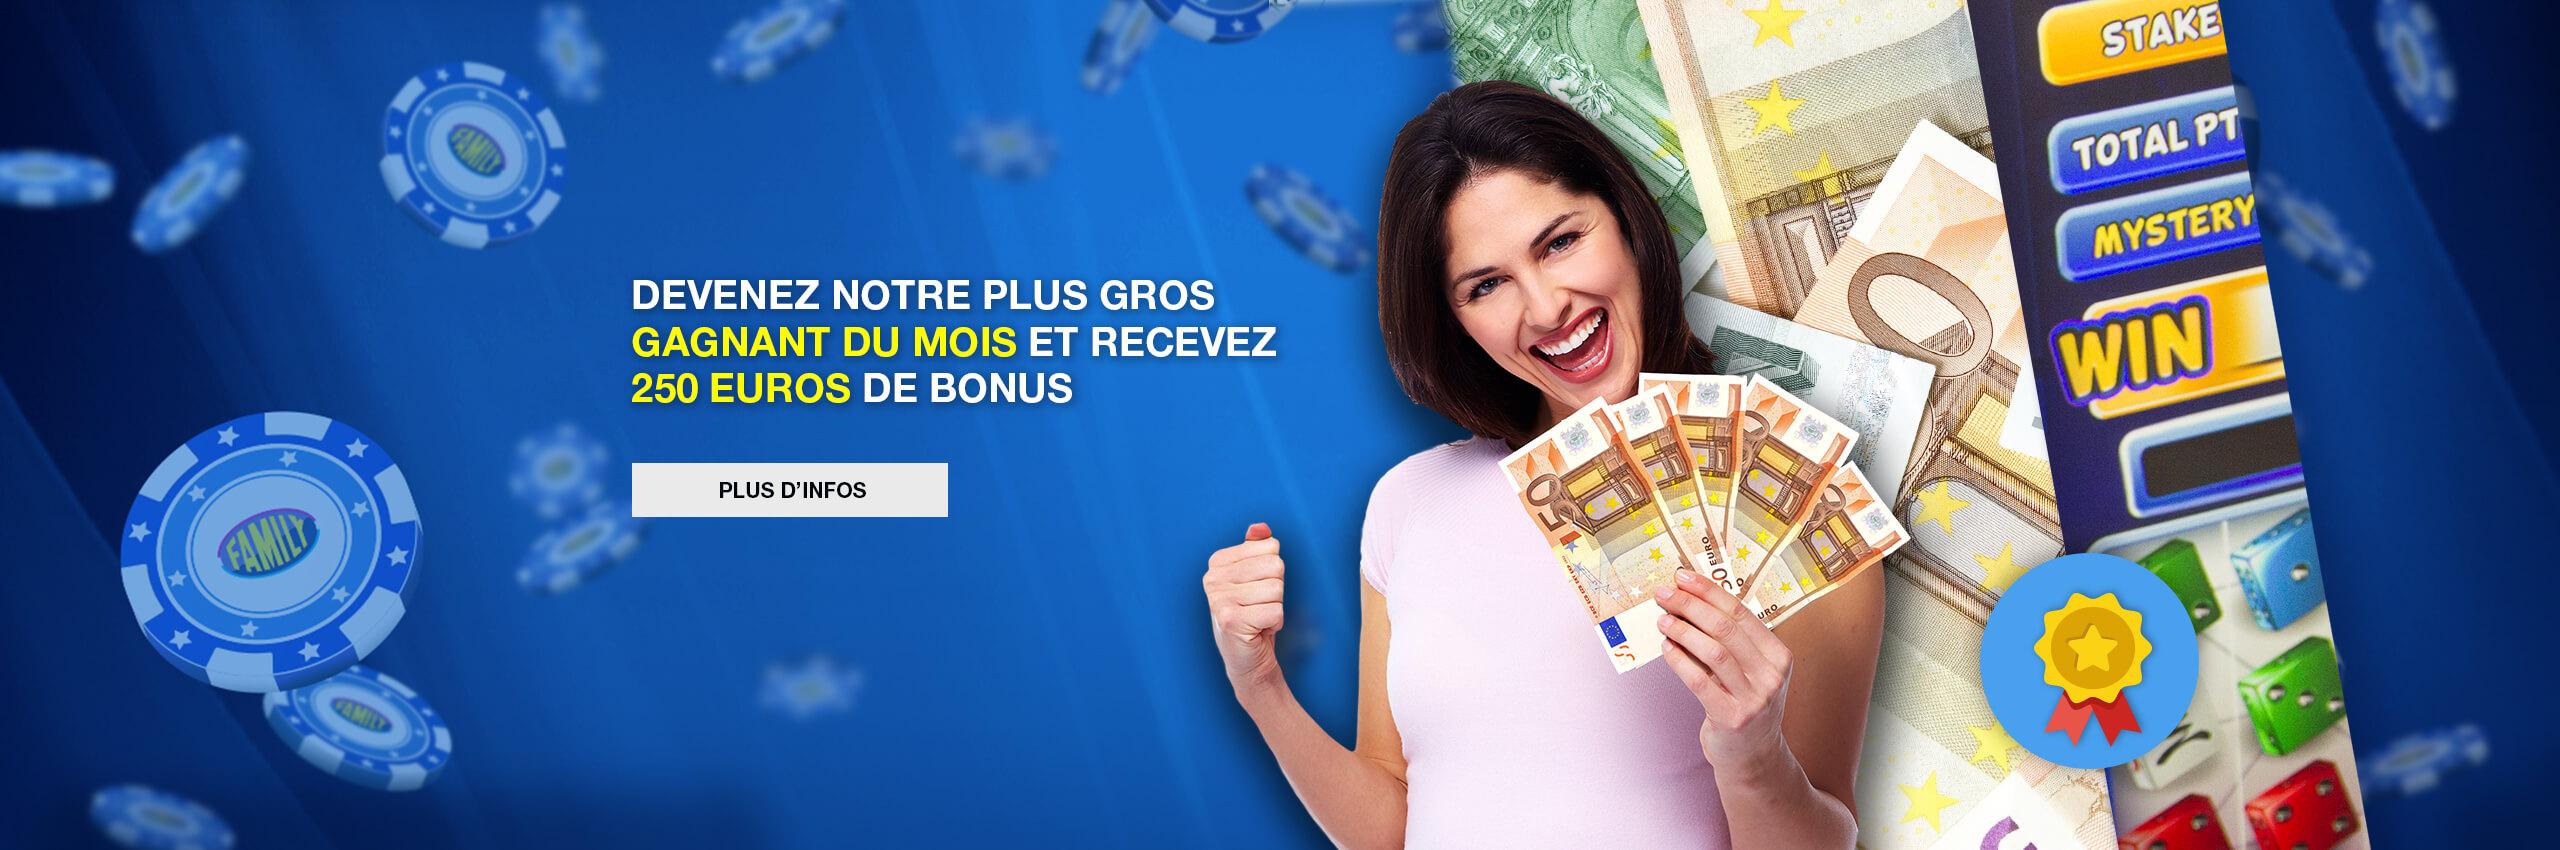 Casino family games belgique espn wsop poker blog